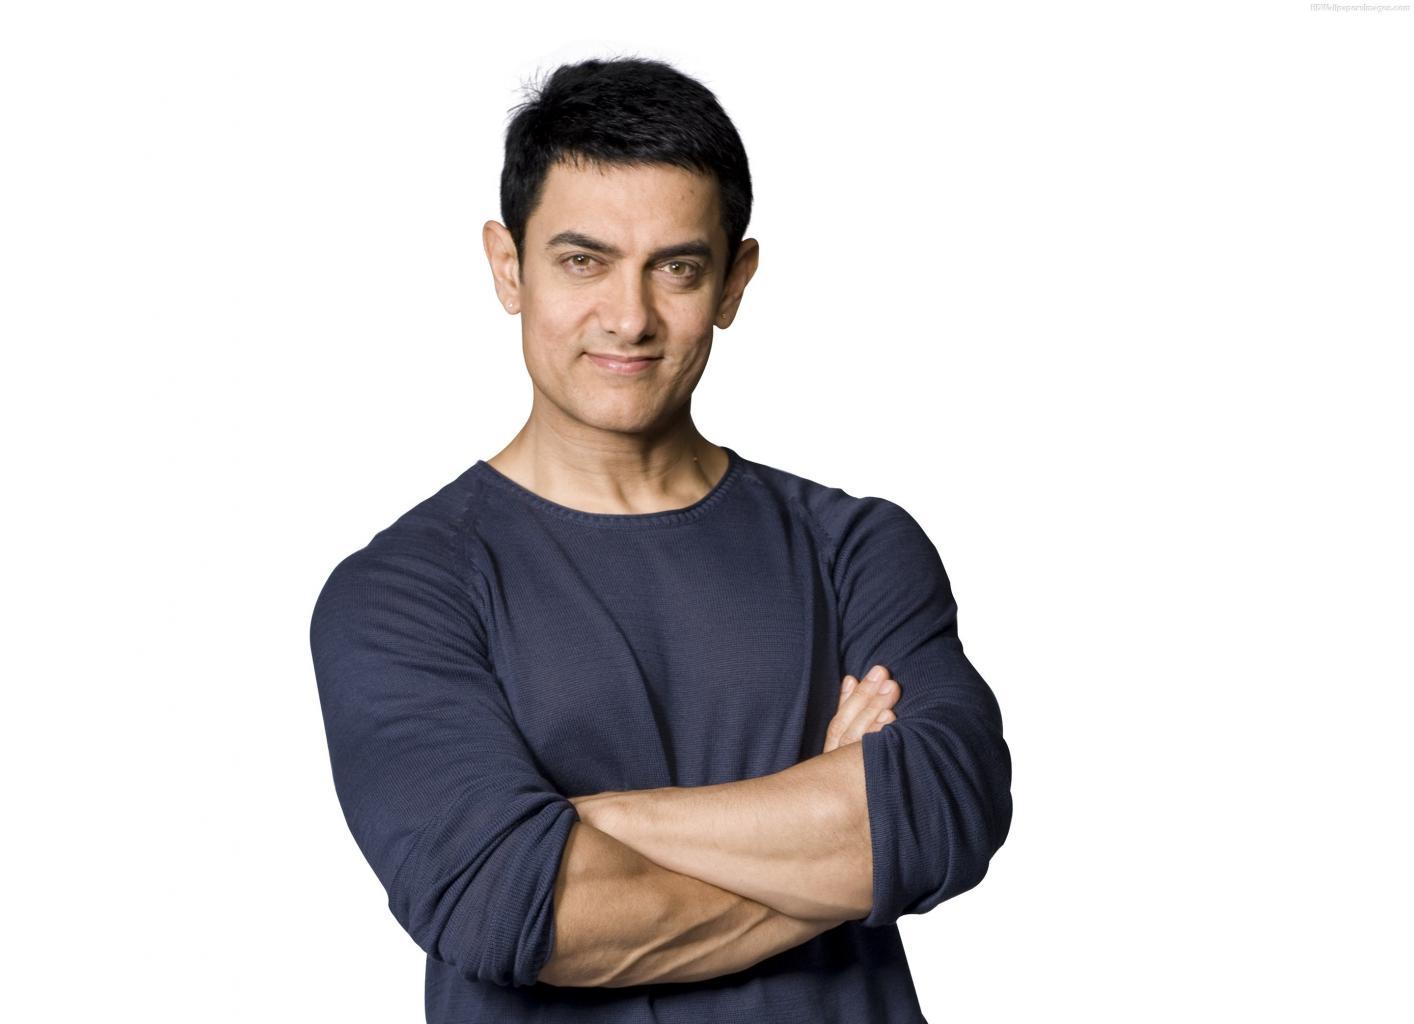 Aamir Khan HD Images Photos Download